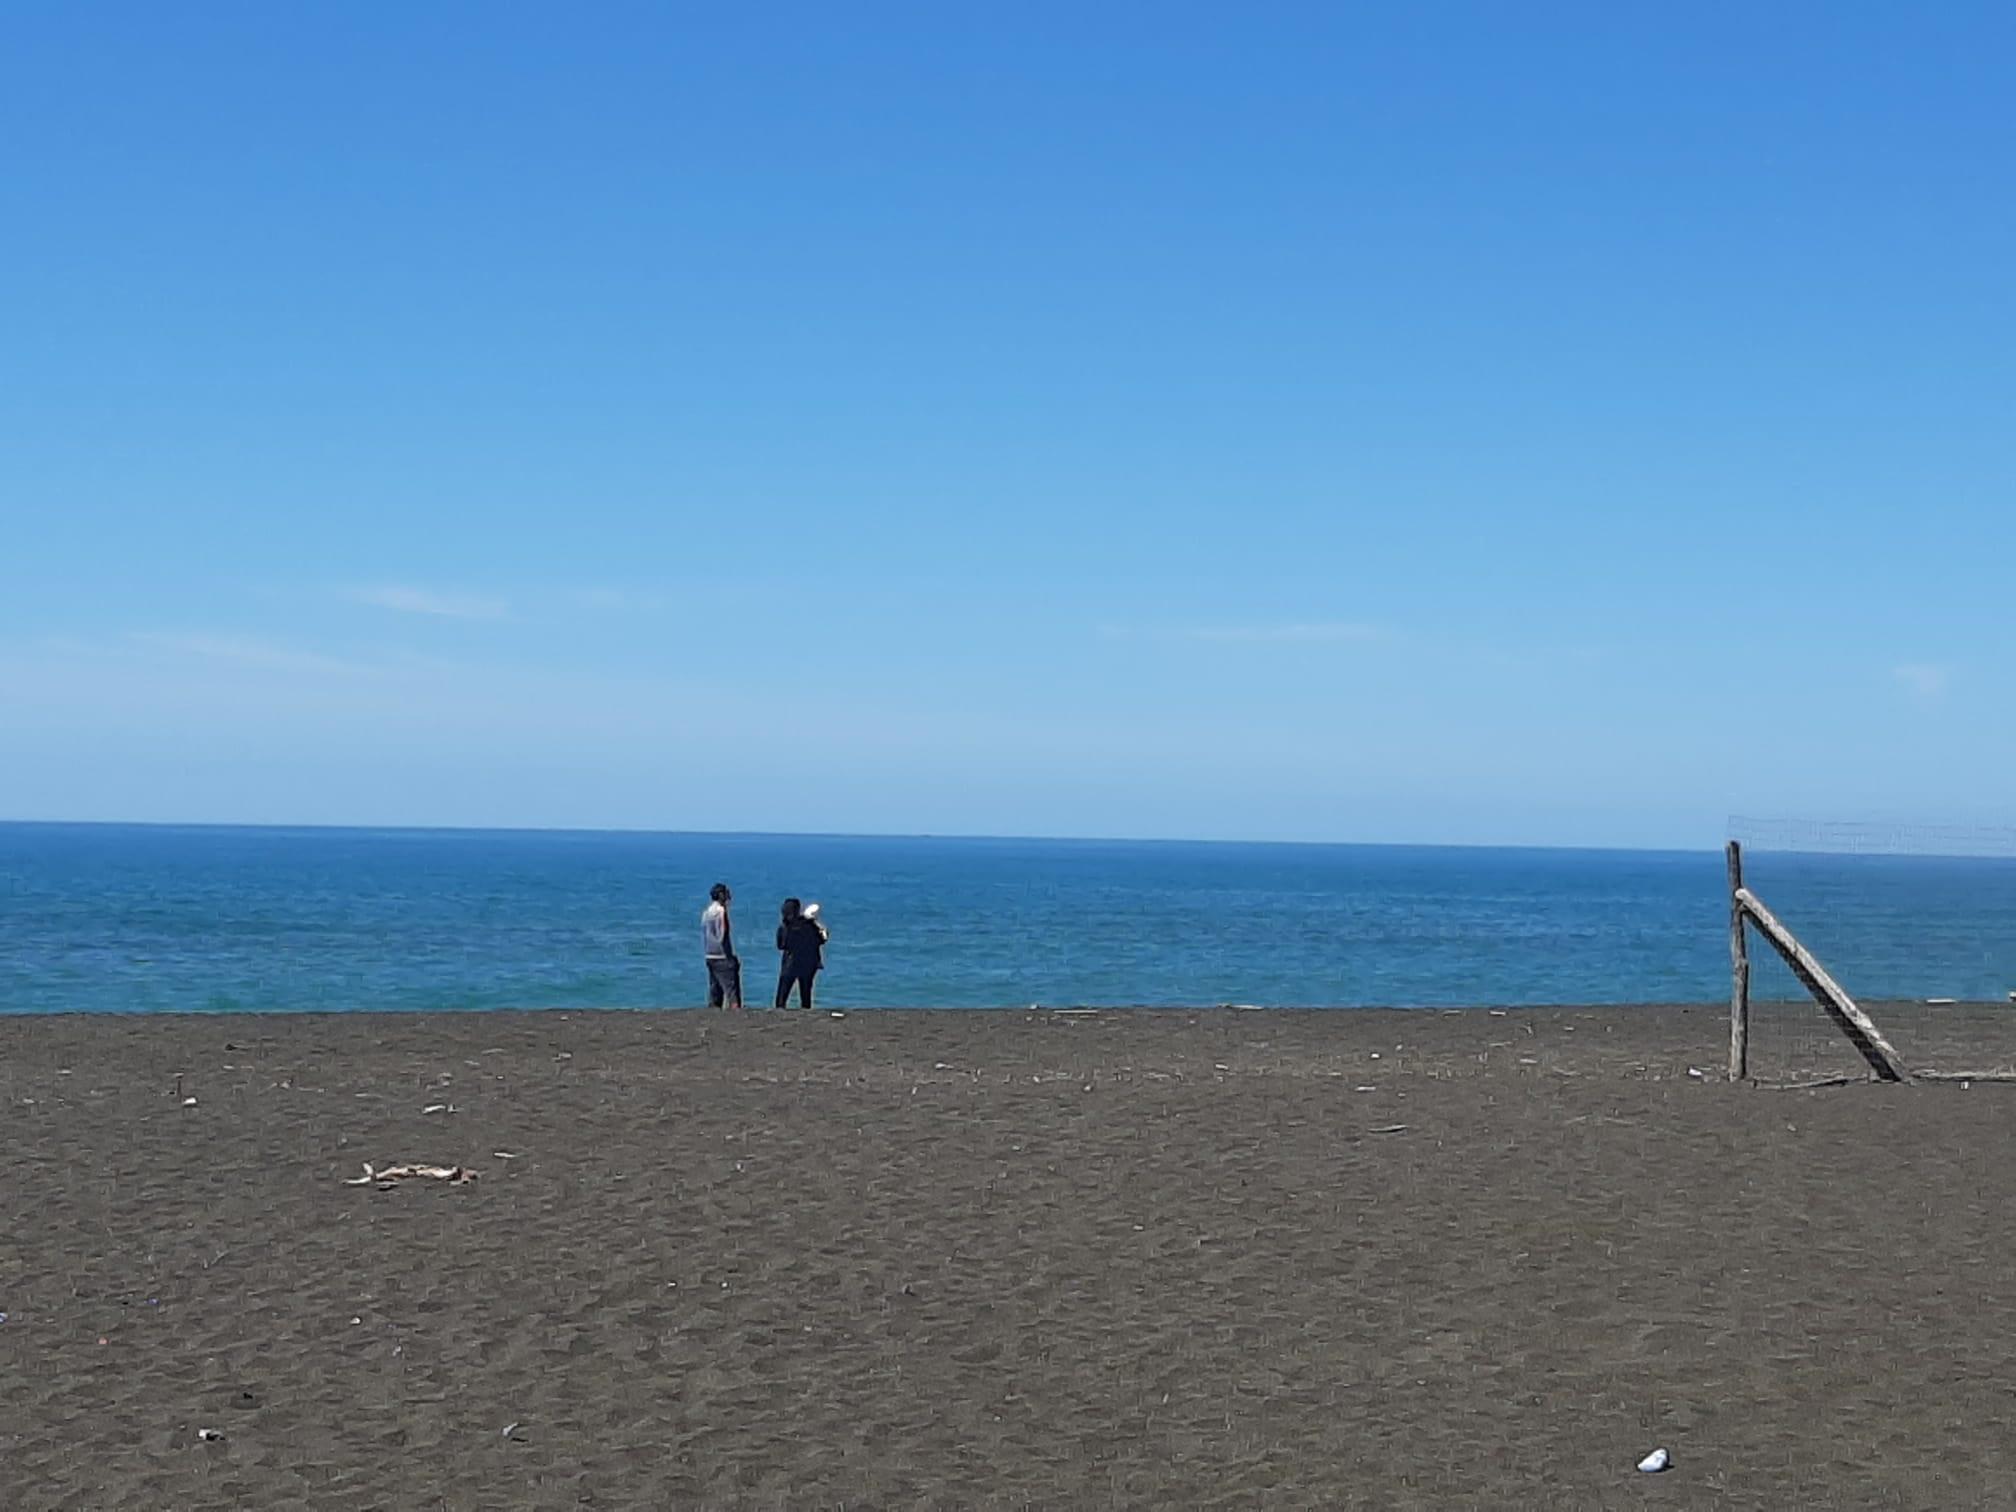 Spiagge libere: 241mila euro a Ladispoli